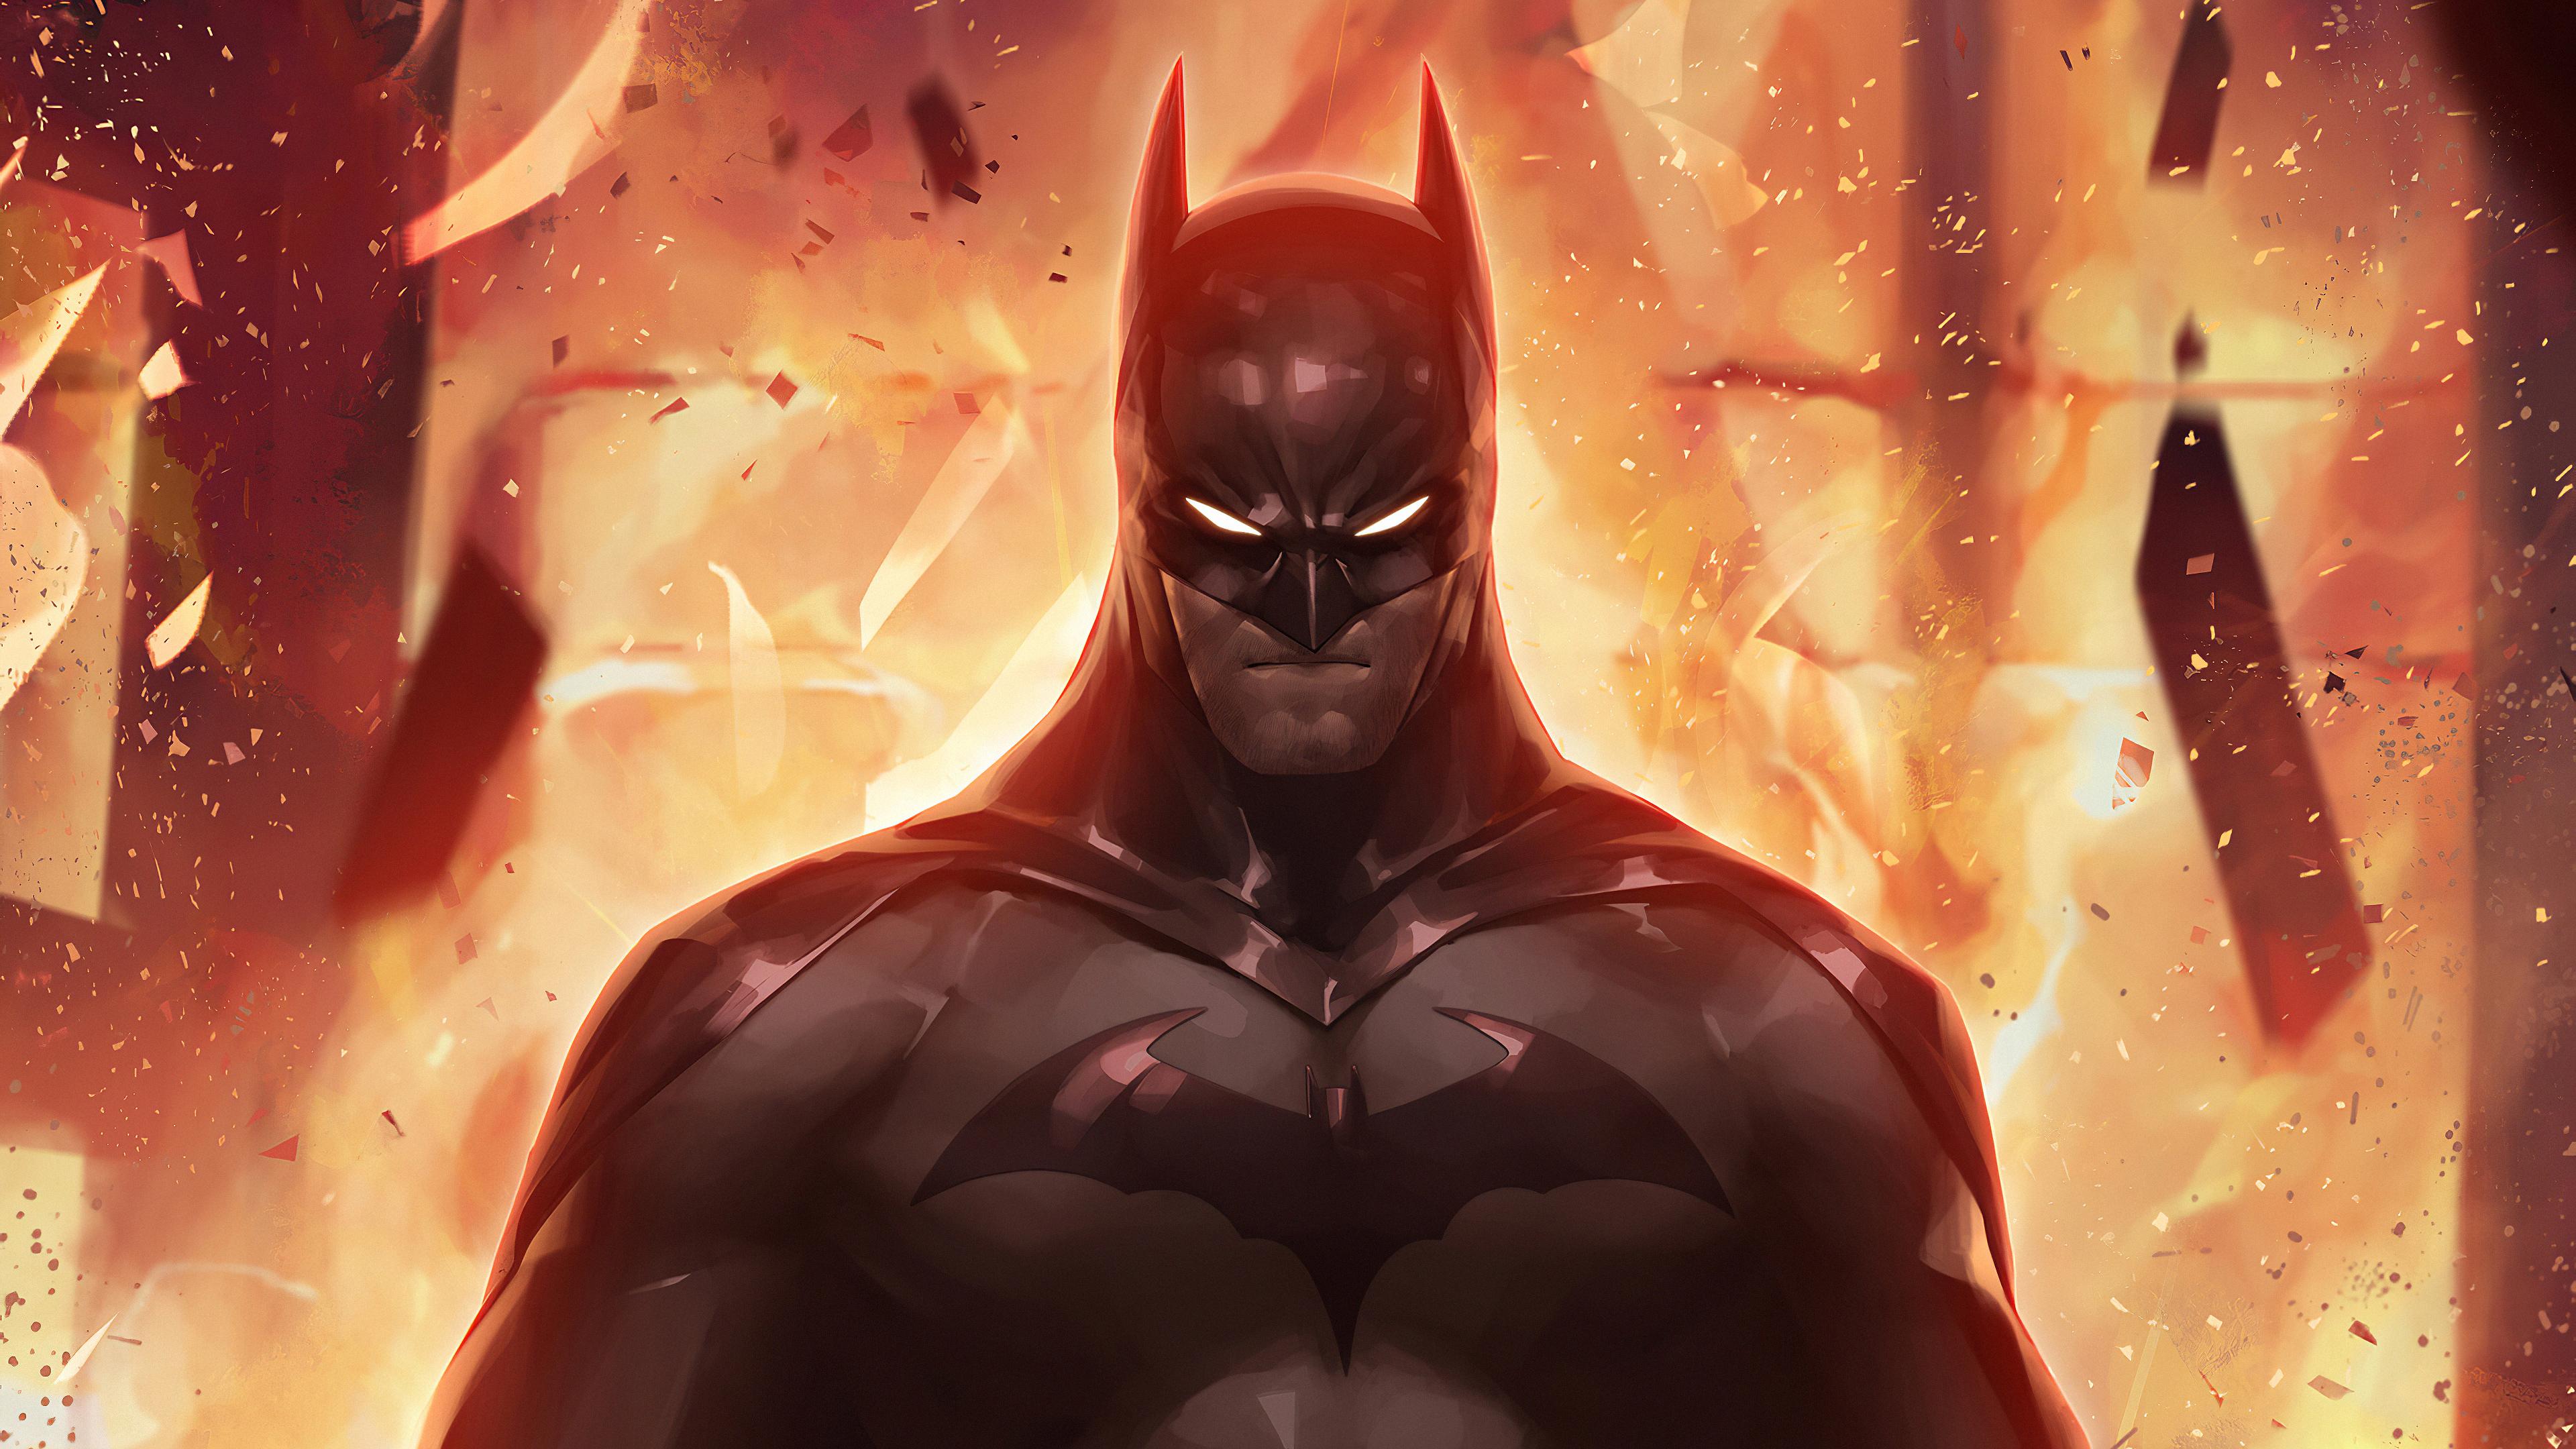 batman in fire 1580585015 - Batman In Fire - batman wallpapers 4k, batman wallpapers, Batman In Fire wallpapers